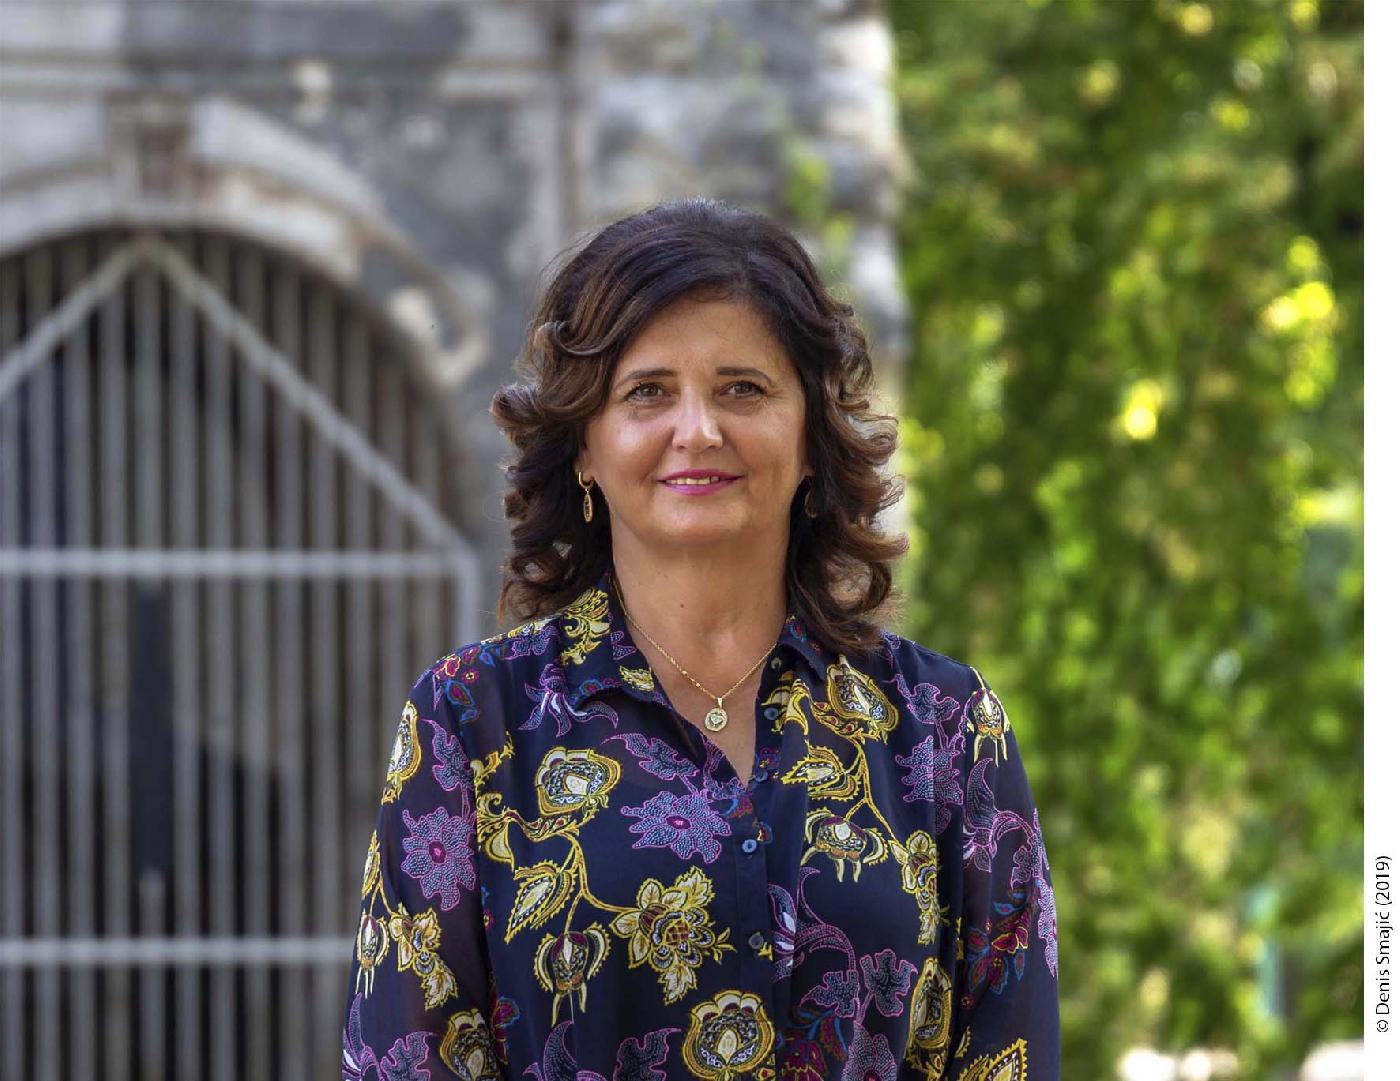 Dženana Gačo, PhD. Vice-Rector for Teaching and Student Affairs